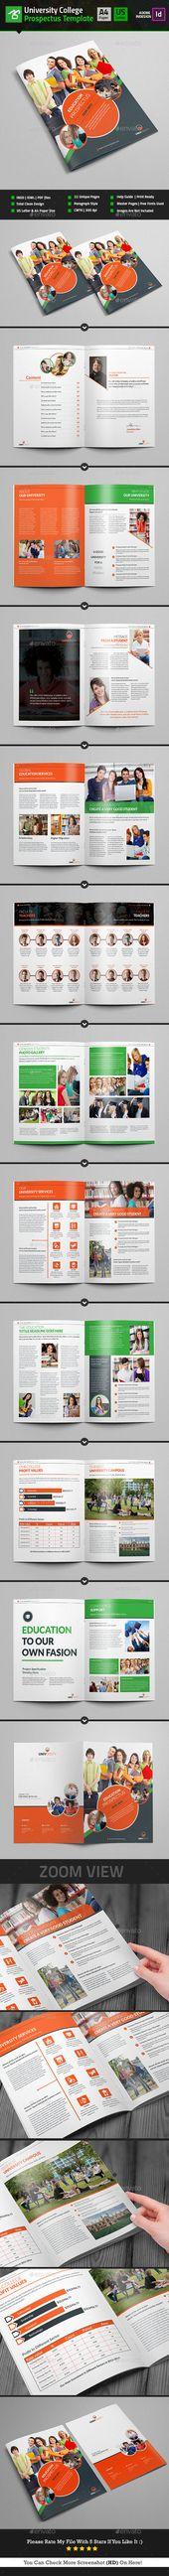 University College Prospectus Design / Magazine – Catalogs Brochure Template InDesign INDD. Download here: graphicriver.net/…